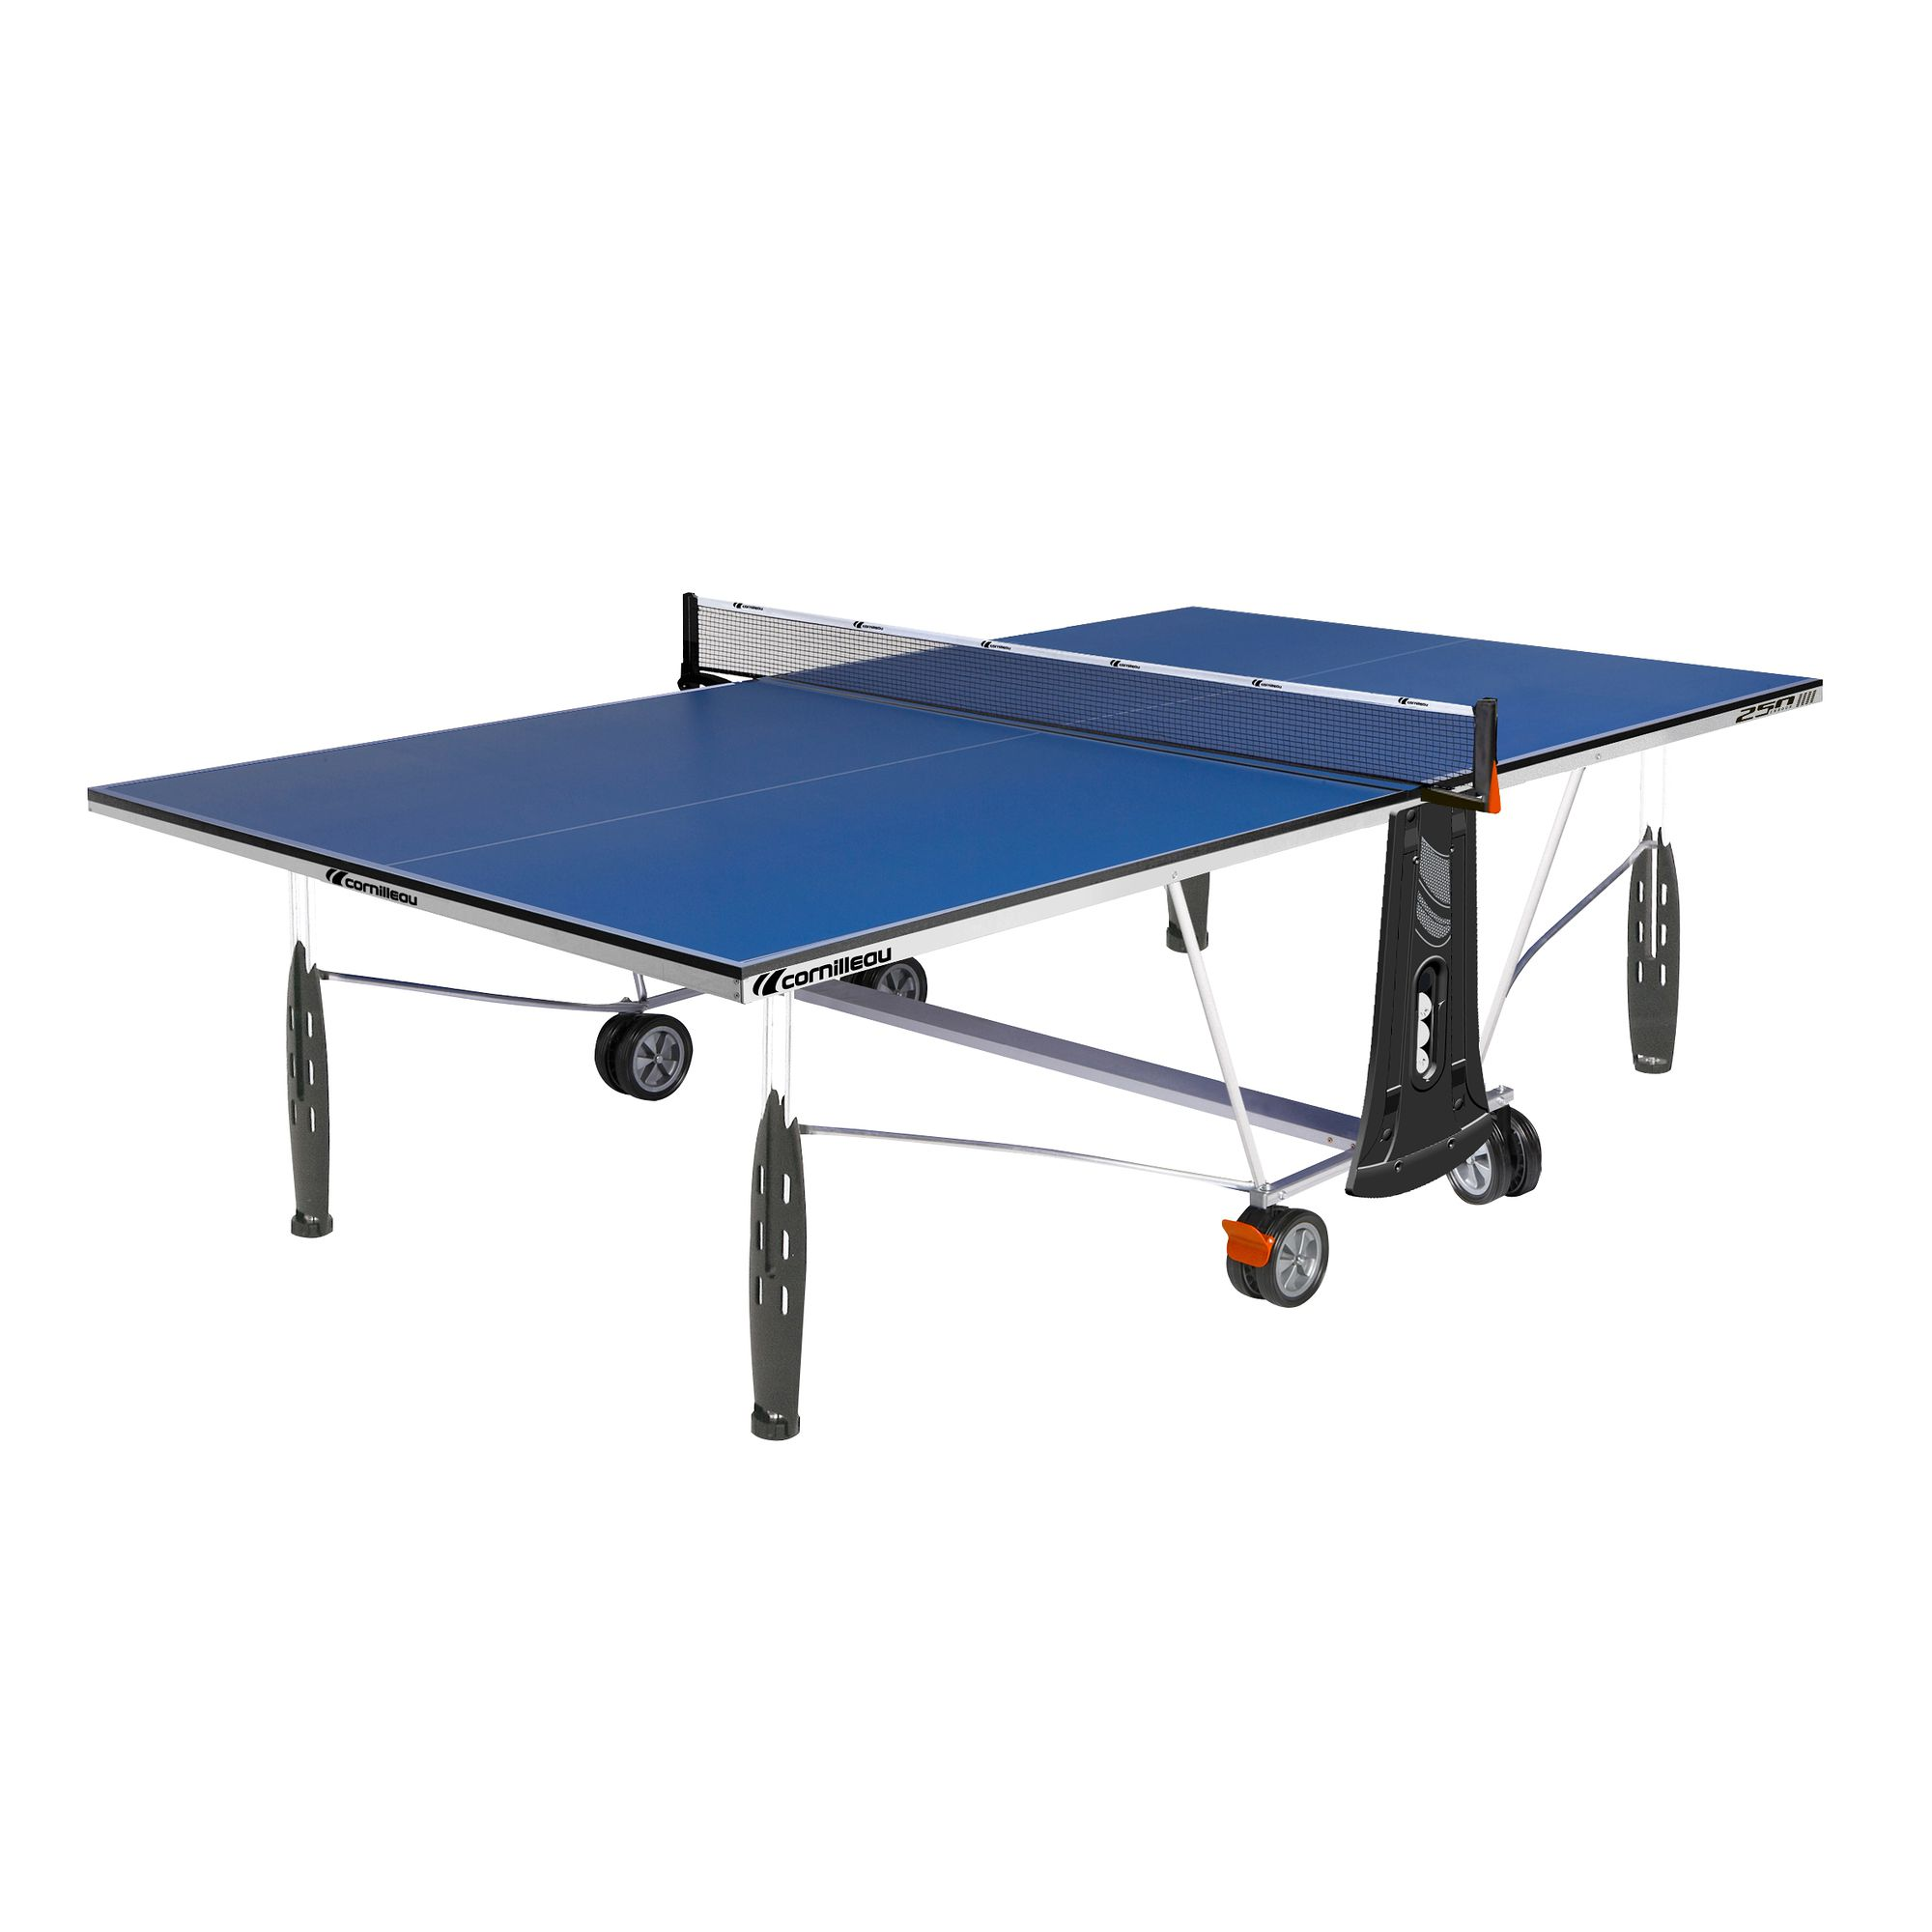 Table de tennis de table interieur cornilleau 250 indoor for Table interieur